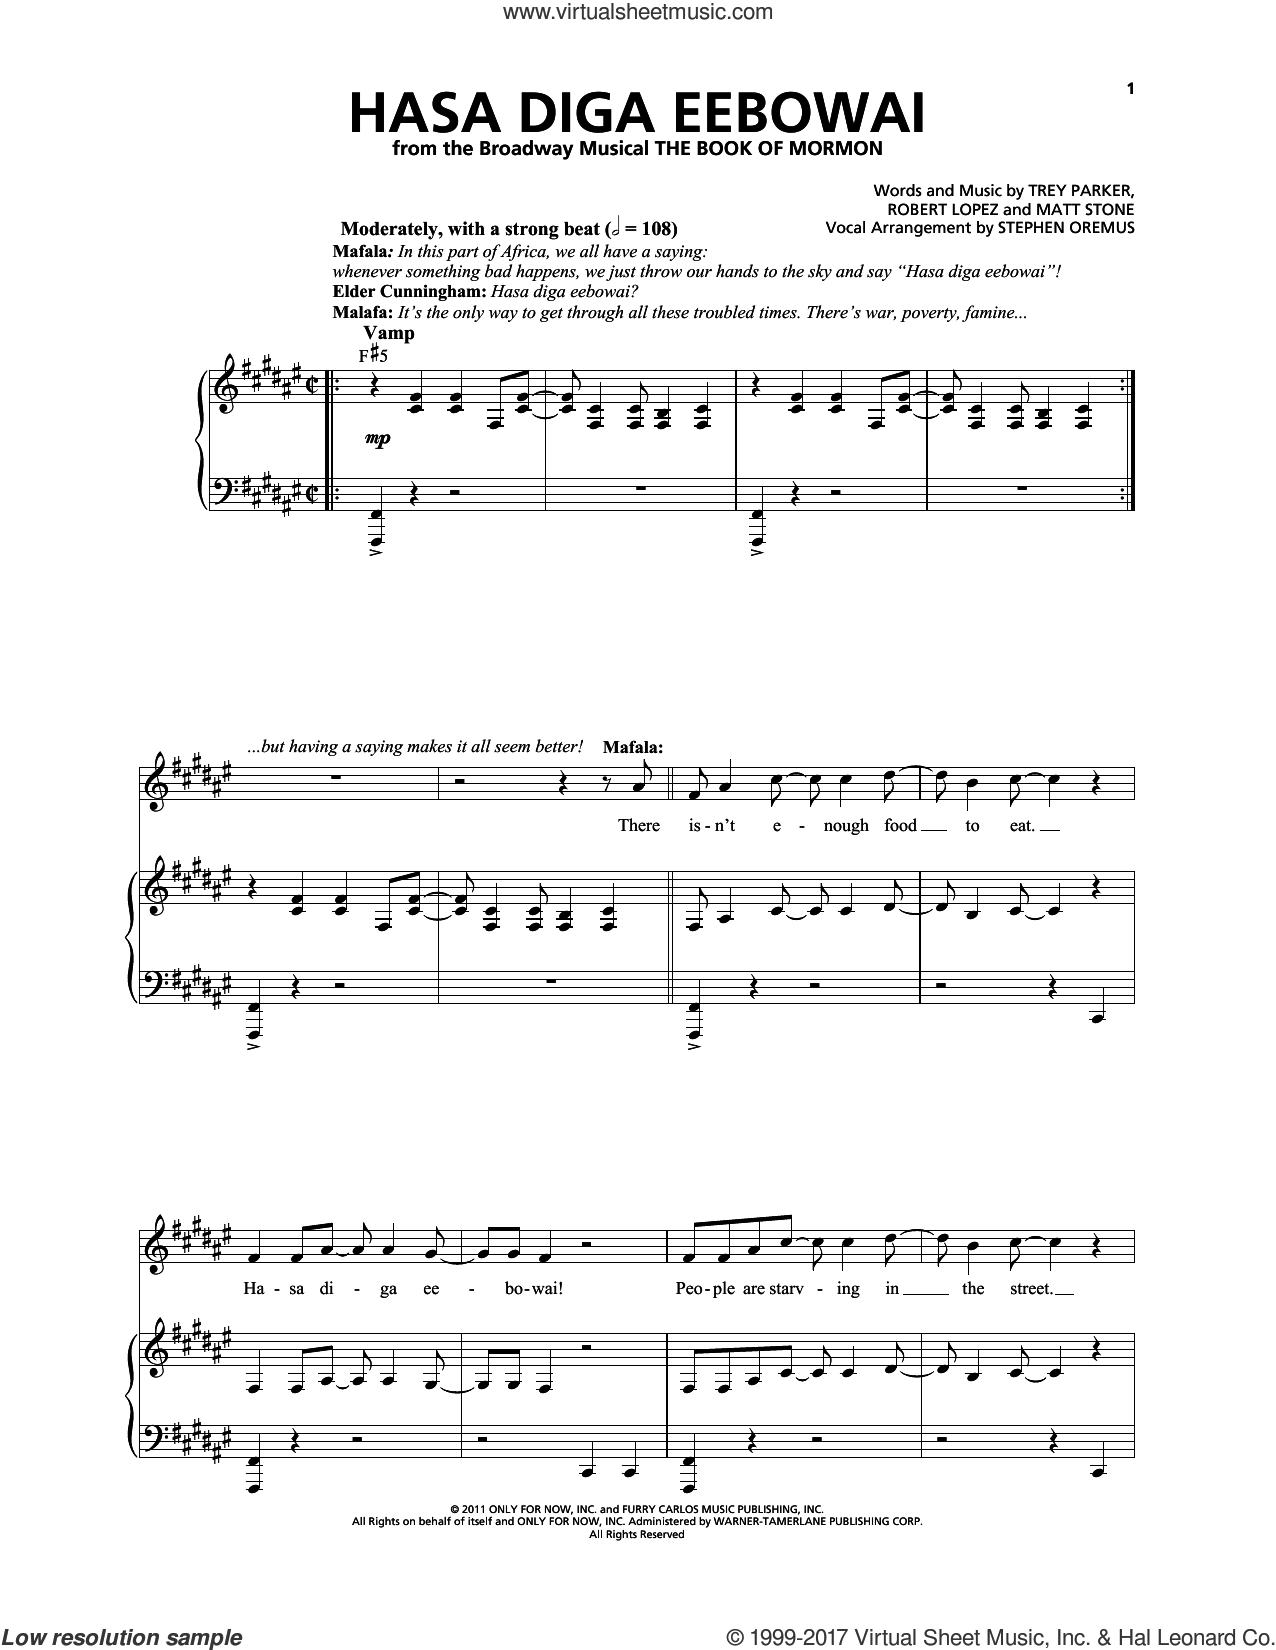 Hasa Diga Eebowai sheet music for voice and piano by Robert Lopez, Matthew Stone, Stephen Oremus, Trey Parker and Trey Parker & Matt Stone, intermediate skill level